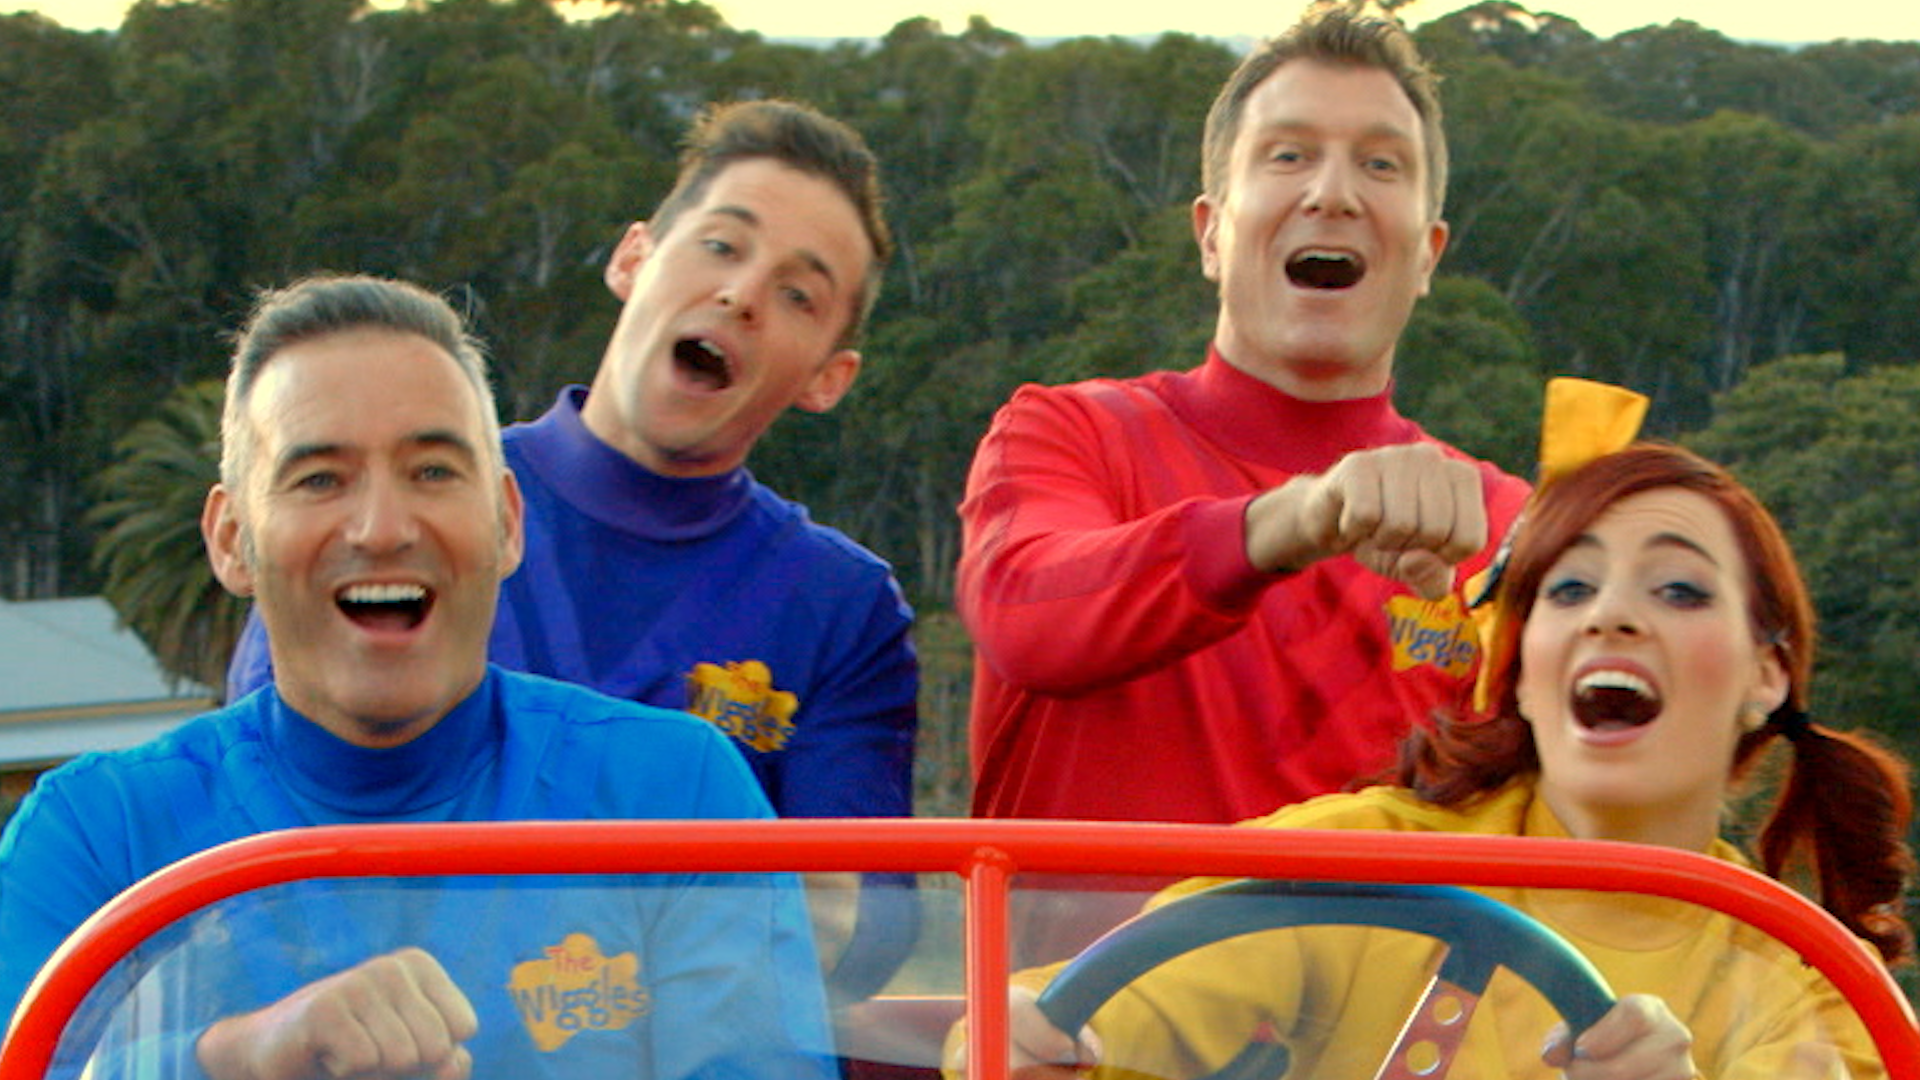 Toot Toot, Chugga Chugga, Big Red Car by The Wiggles